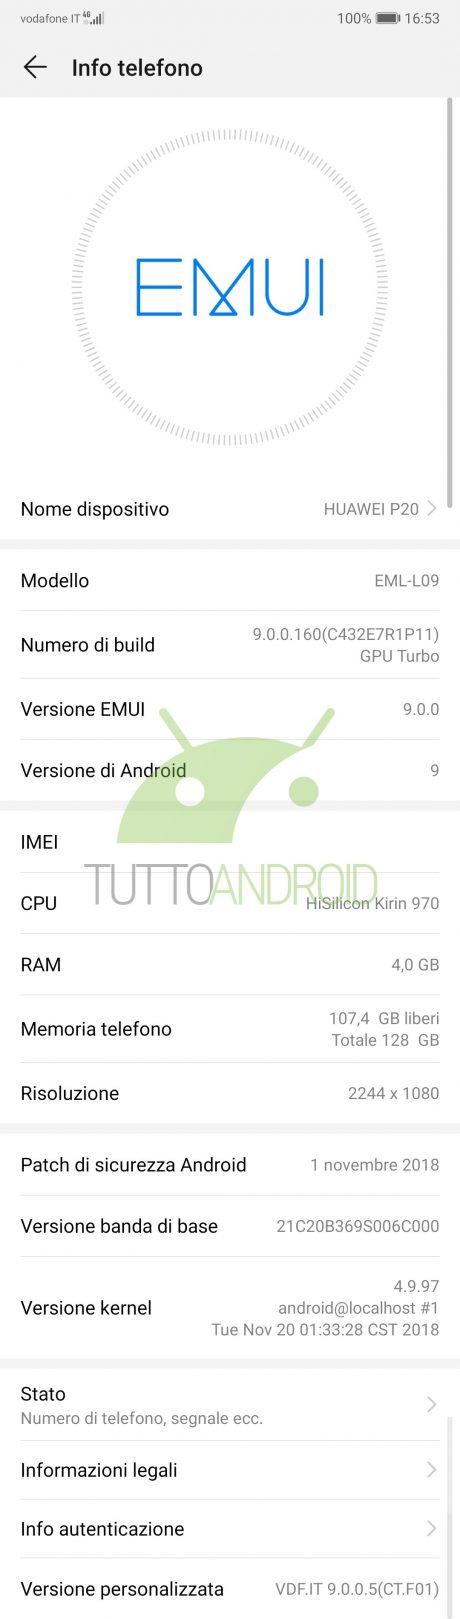 Screenshot 20181221 165351 com.android.settings